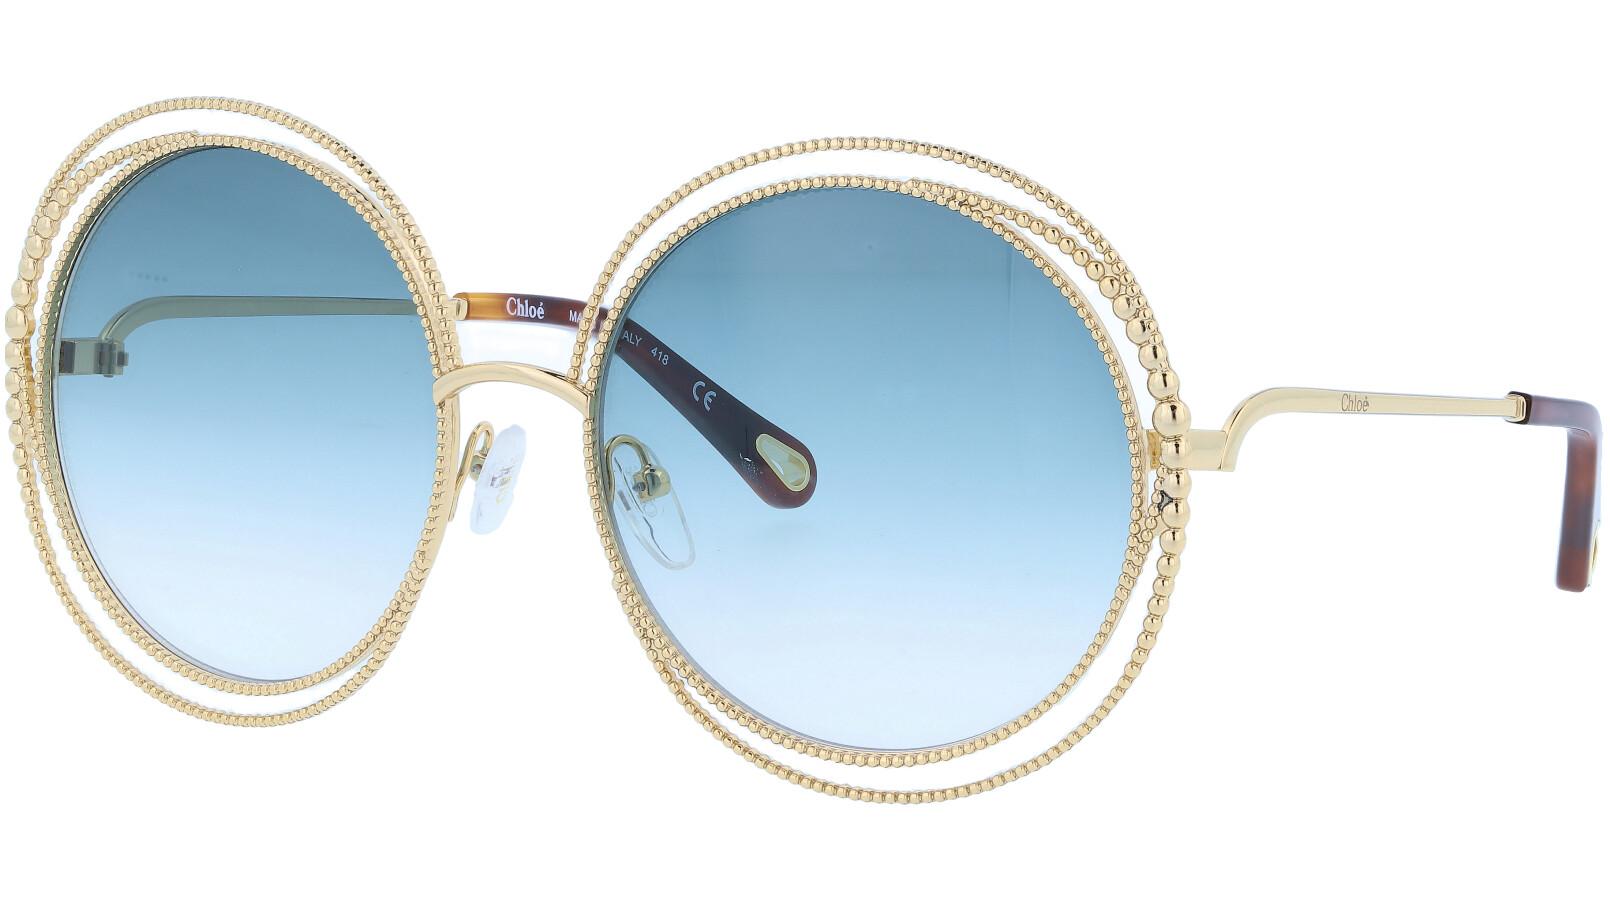 Chloé CE114SC 838 58 Gold Round Sunglasses